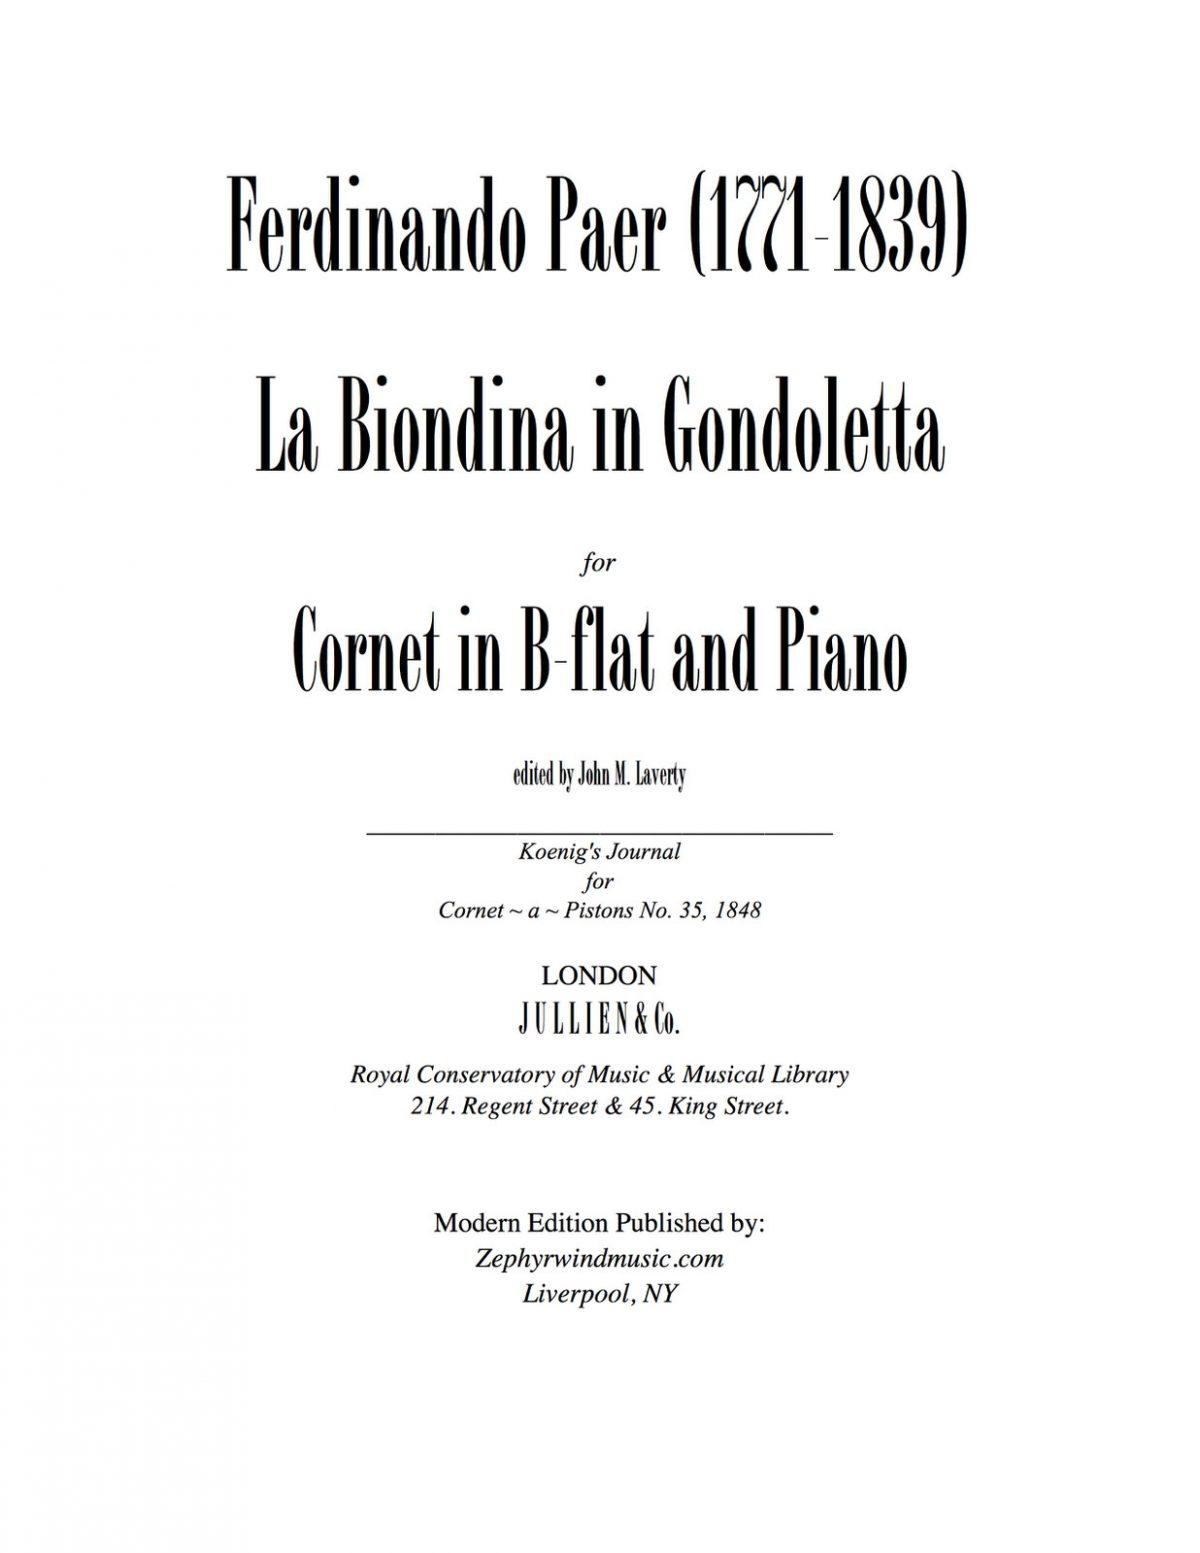 Paer, Le Biondina